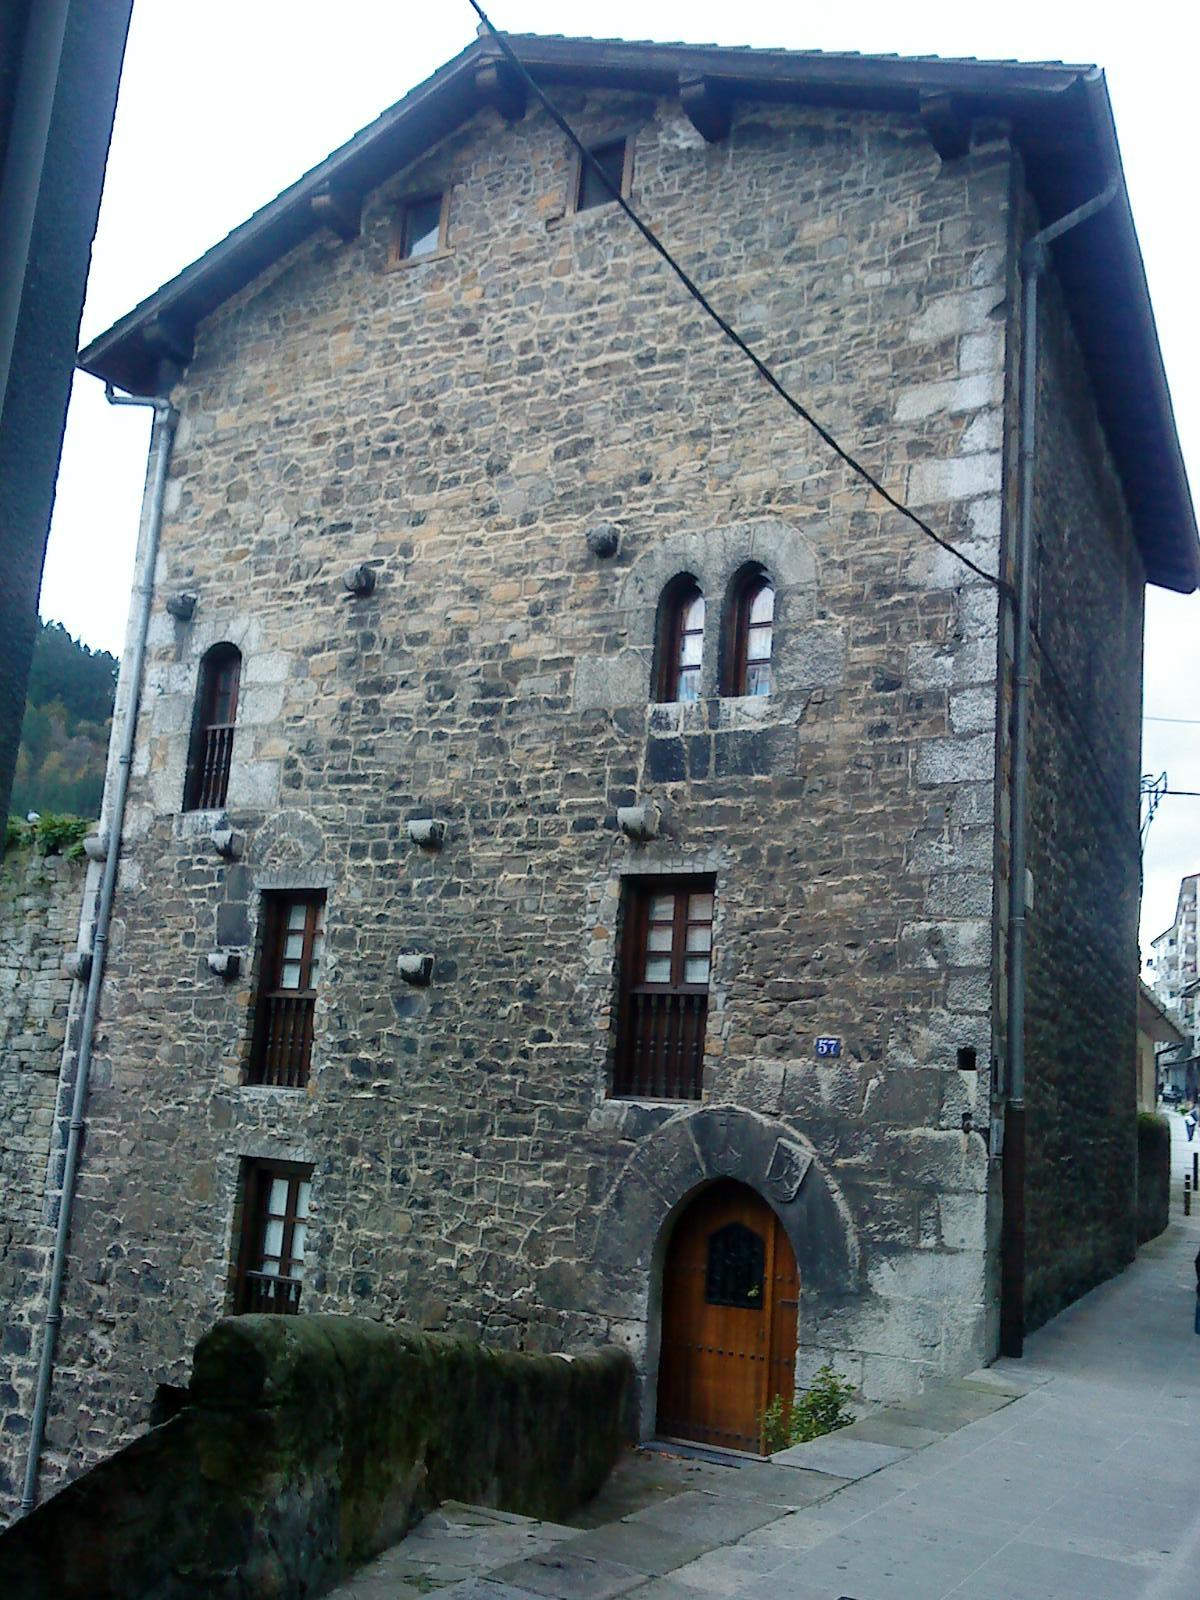 casa torre likona wikipedia la enciclopedia libre On torre de la casa de granito